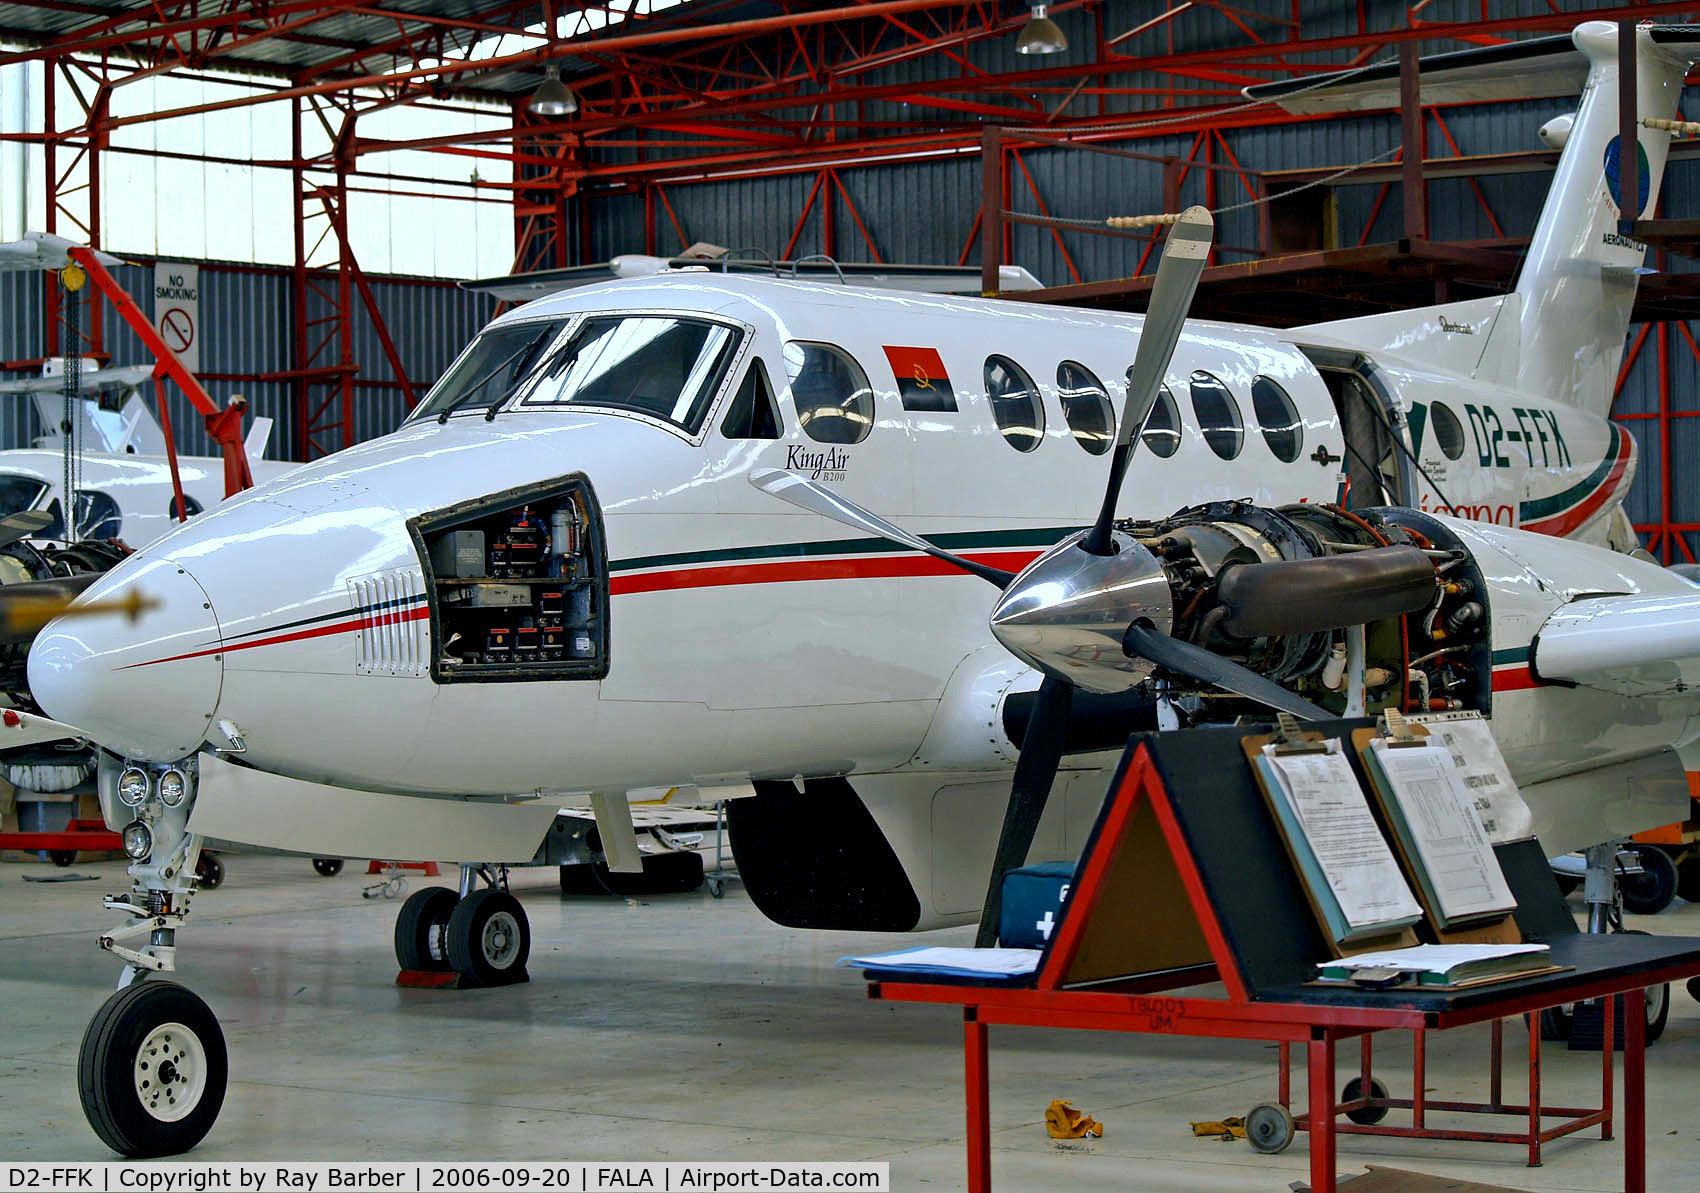 D2-FFK, 1981 Beech B200 King Air C/N BB-1026, Beech B200 Super King Air [BB-1026] (Tropicana) Lanseria~ZS 20/09/2006. Undergoing a overhaul in this tightly packed hangar.